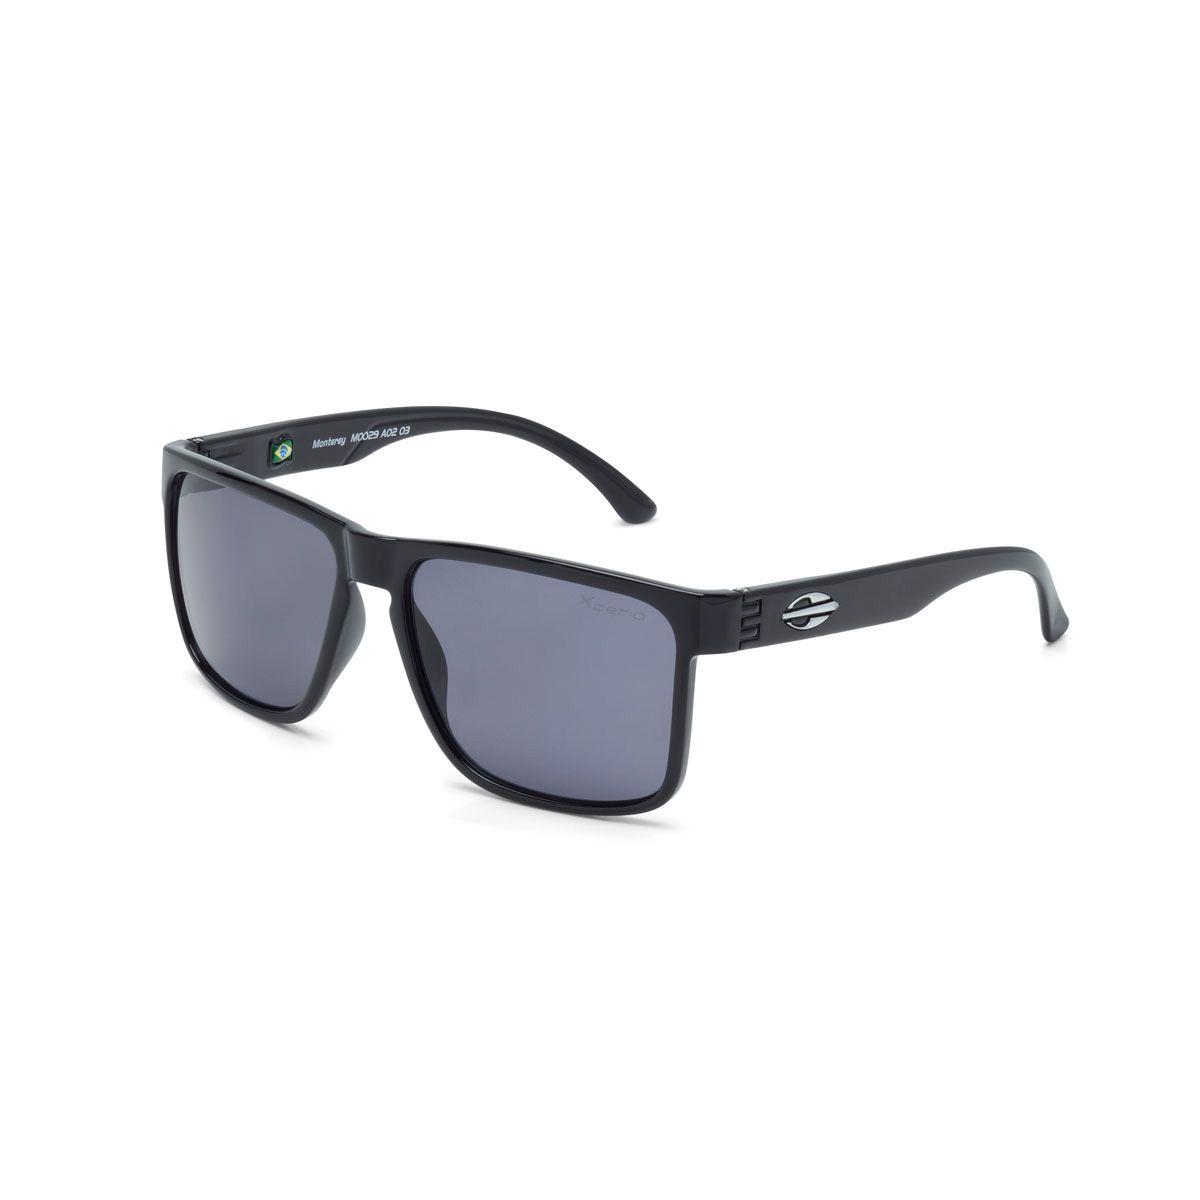 Óculos de Sol Mormaii Monterey M0029A0203   Óculos   Pinterest b0acdac0ed